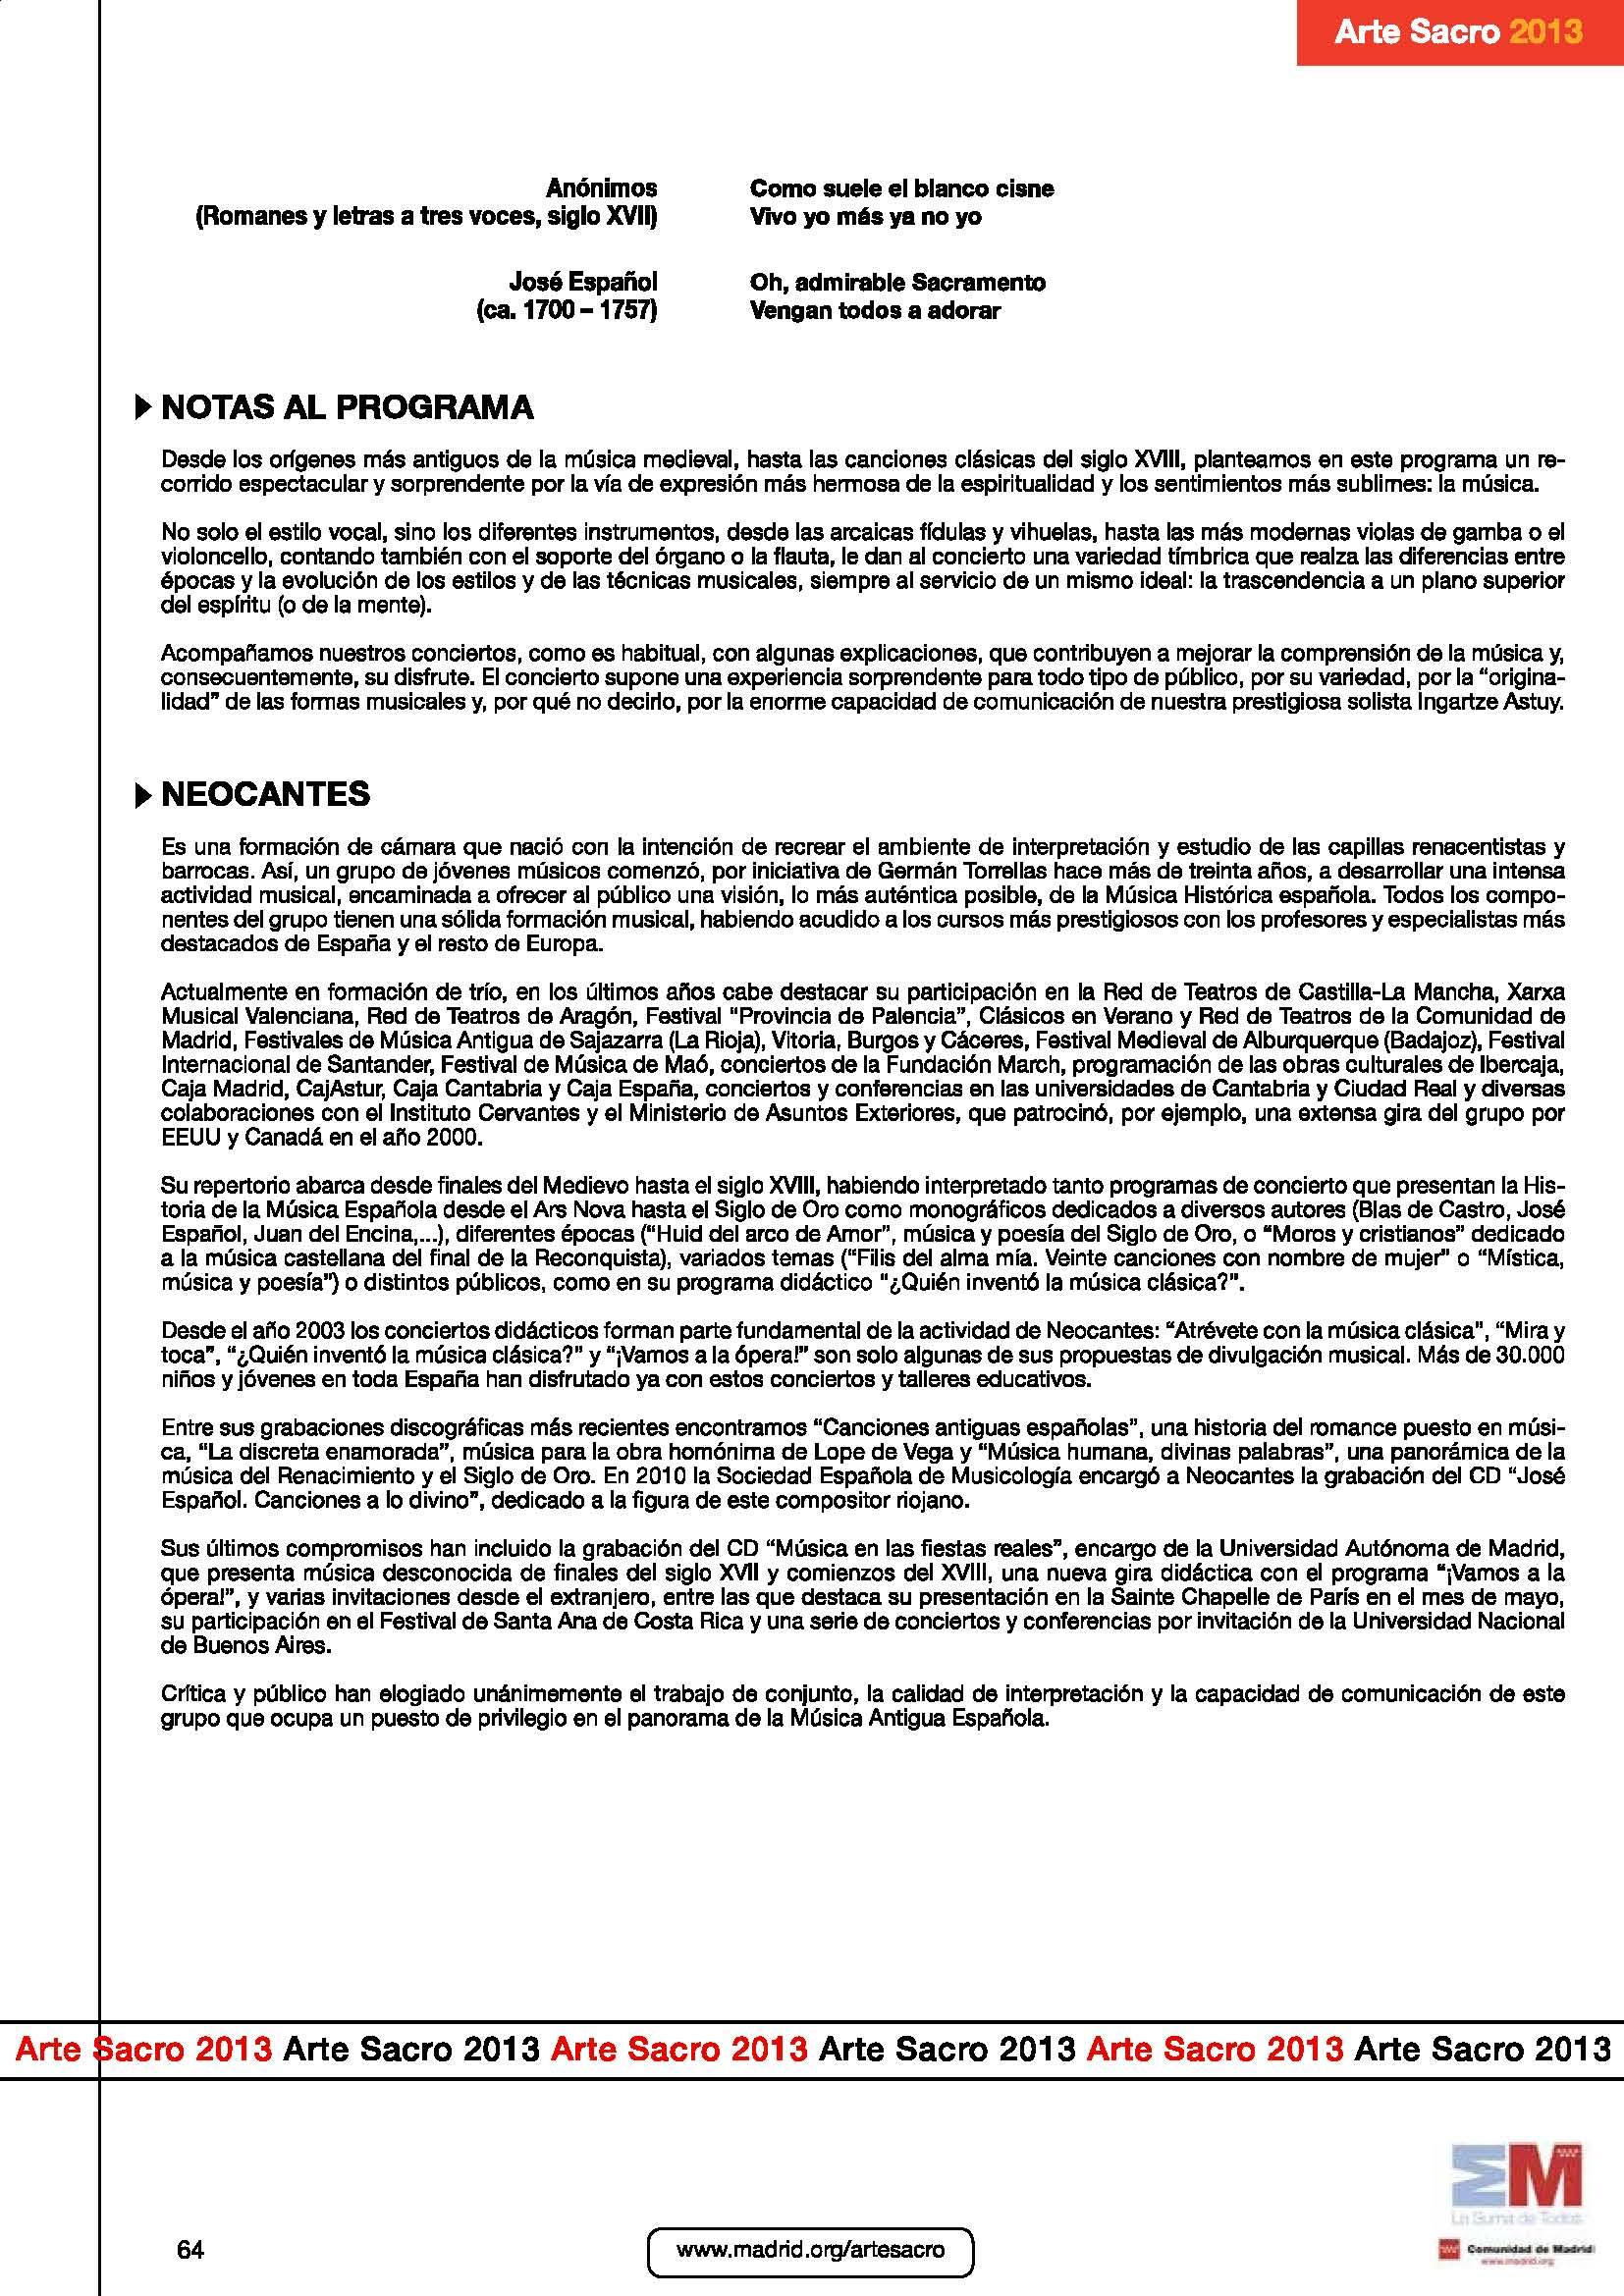 dossier_completo_Página_064